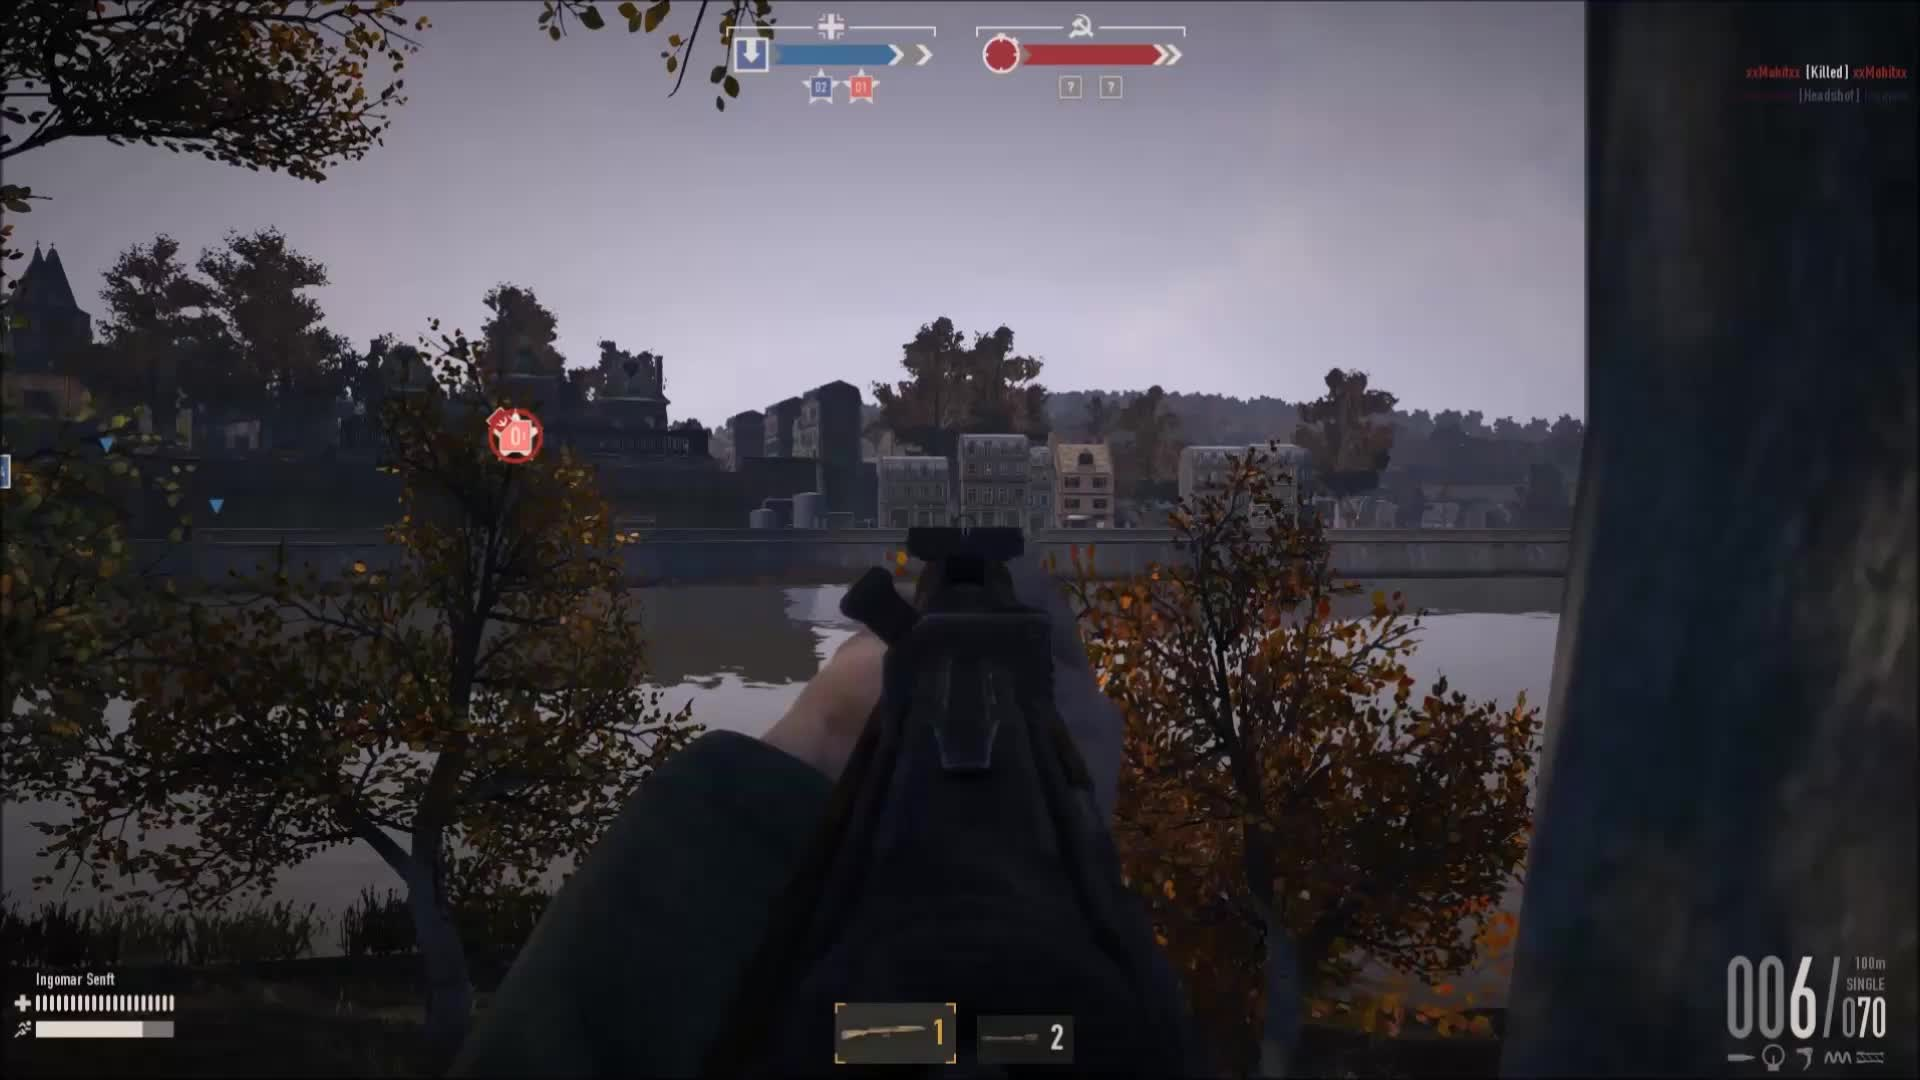 headshot, heroesandgenerals, save damnit, heroes and generals GIFs